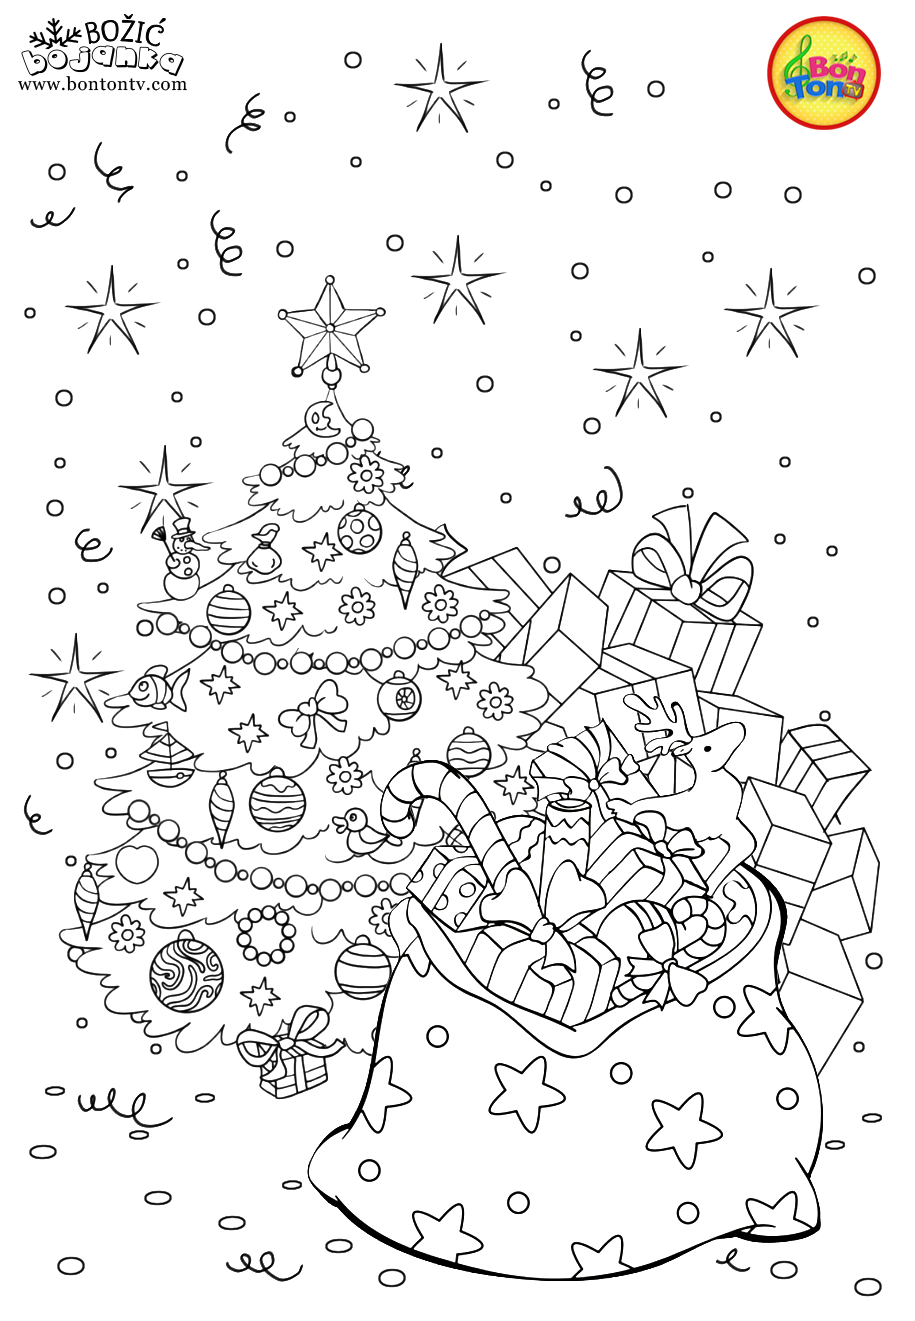 Christmas Coloring Pages - Božić bojanke za djecu - Free Printables for Kids - Christmas Tree, Cookies, Santa Claus and Snowman, Reindeers and more on BonTon TV - Coloring Books #christmas #coloringpages #coloringbooks #printables #božić #bontontv #coloringpagestoprint